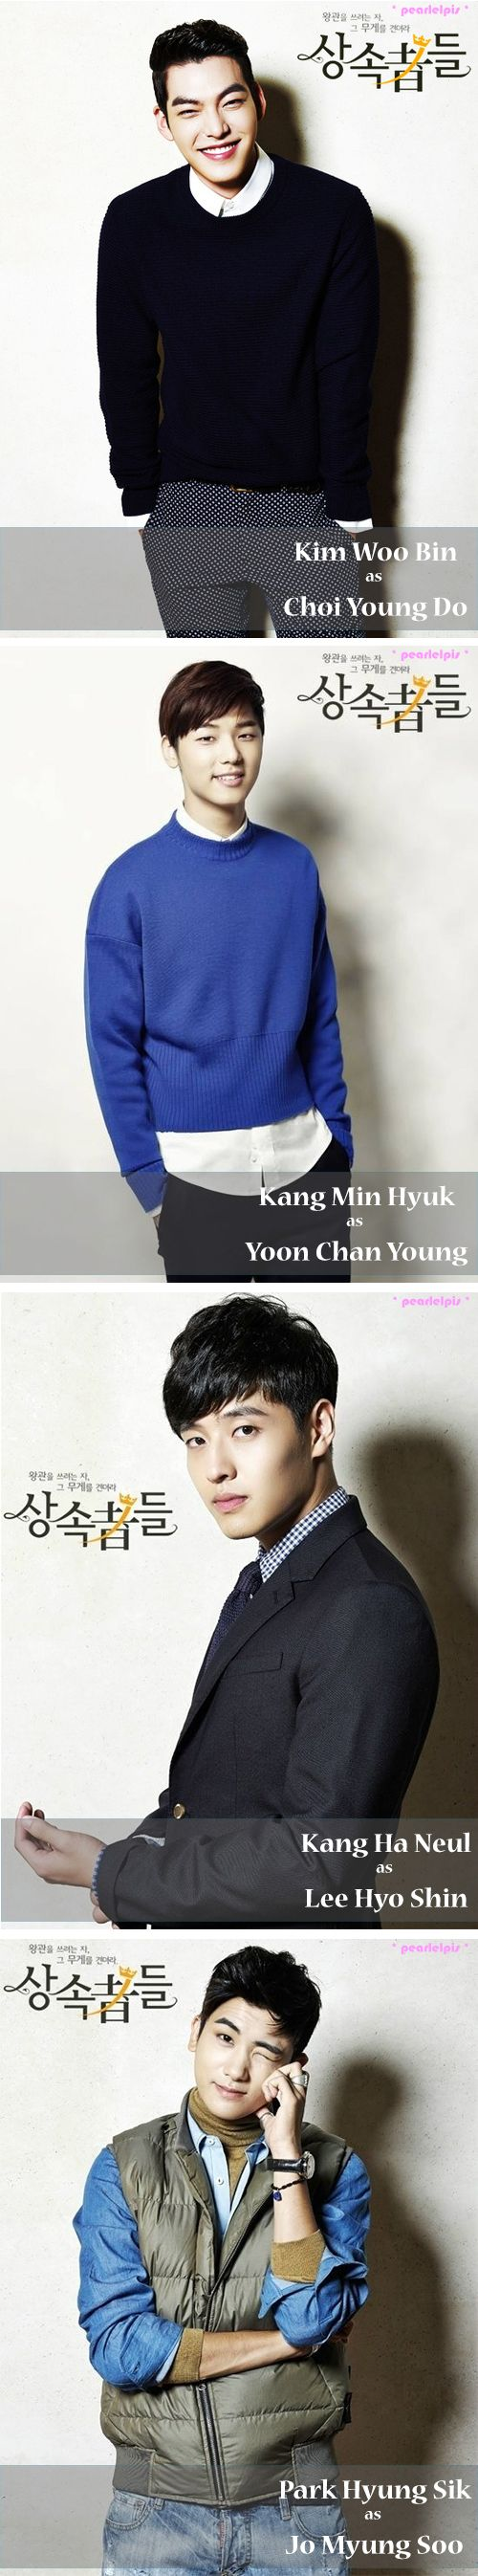 #Heirs / Inheritors casts 2 of 3 : Kim Woo Bin, Kang Min Hyuk, Kang Ha Neul, Park Hyung Sik